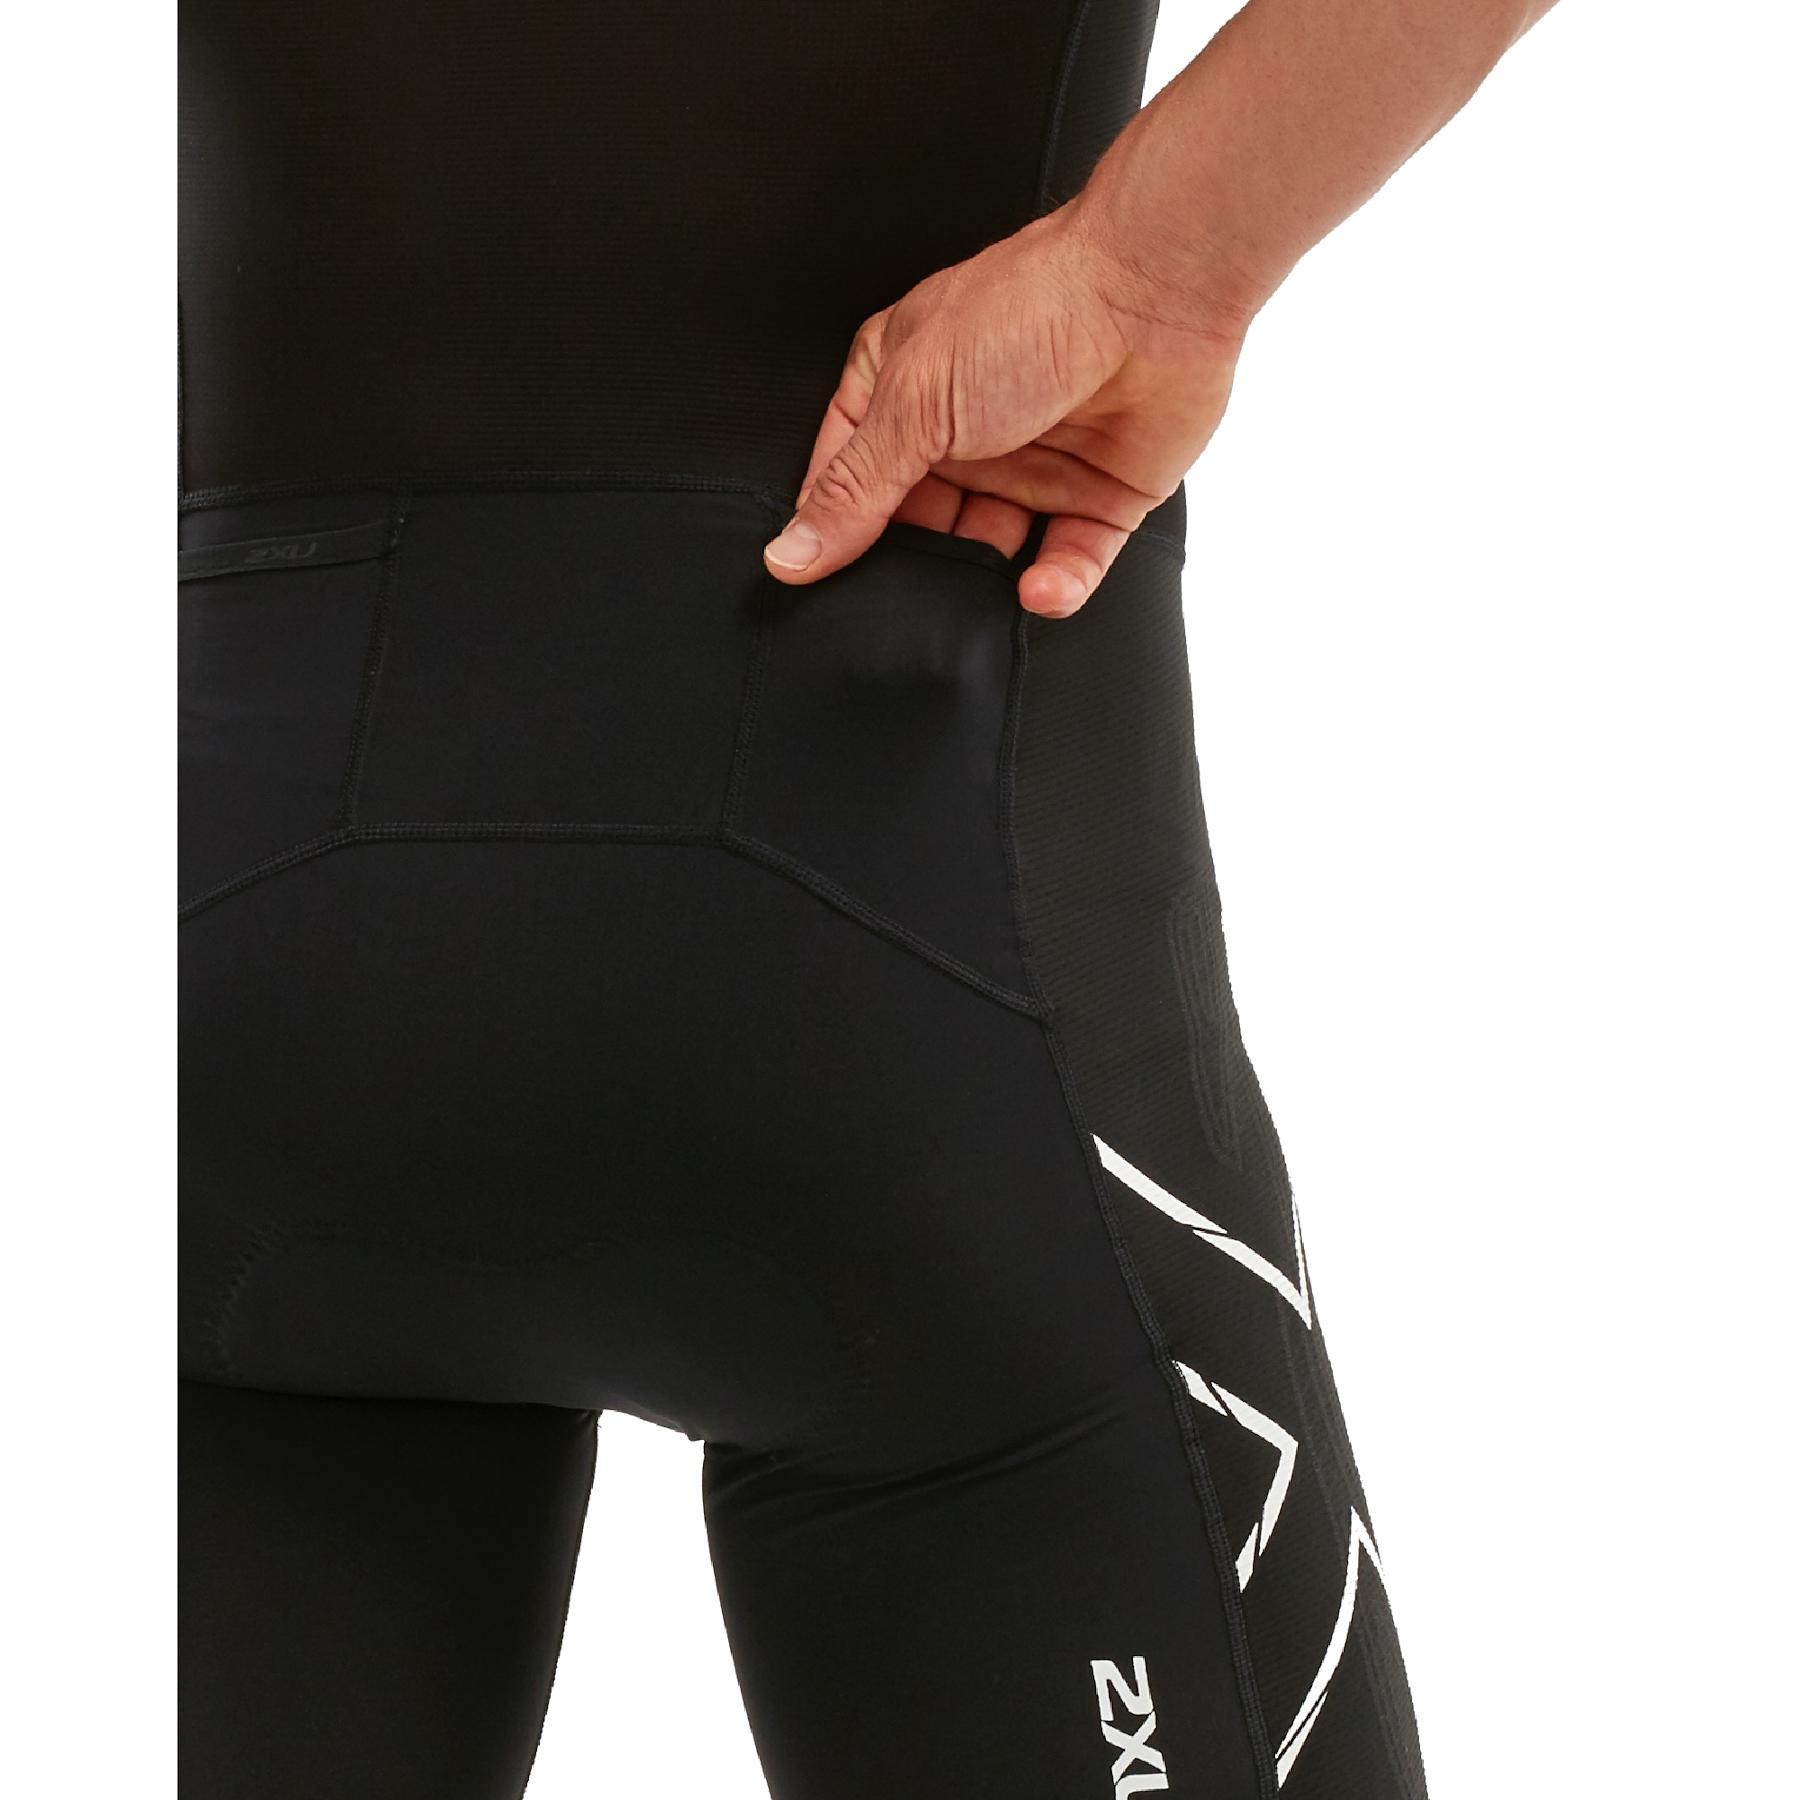 Imagen de 2XU Compression Full Zip Sleeved Trisuit - black/chroma